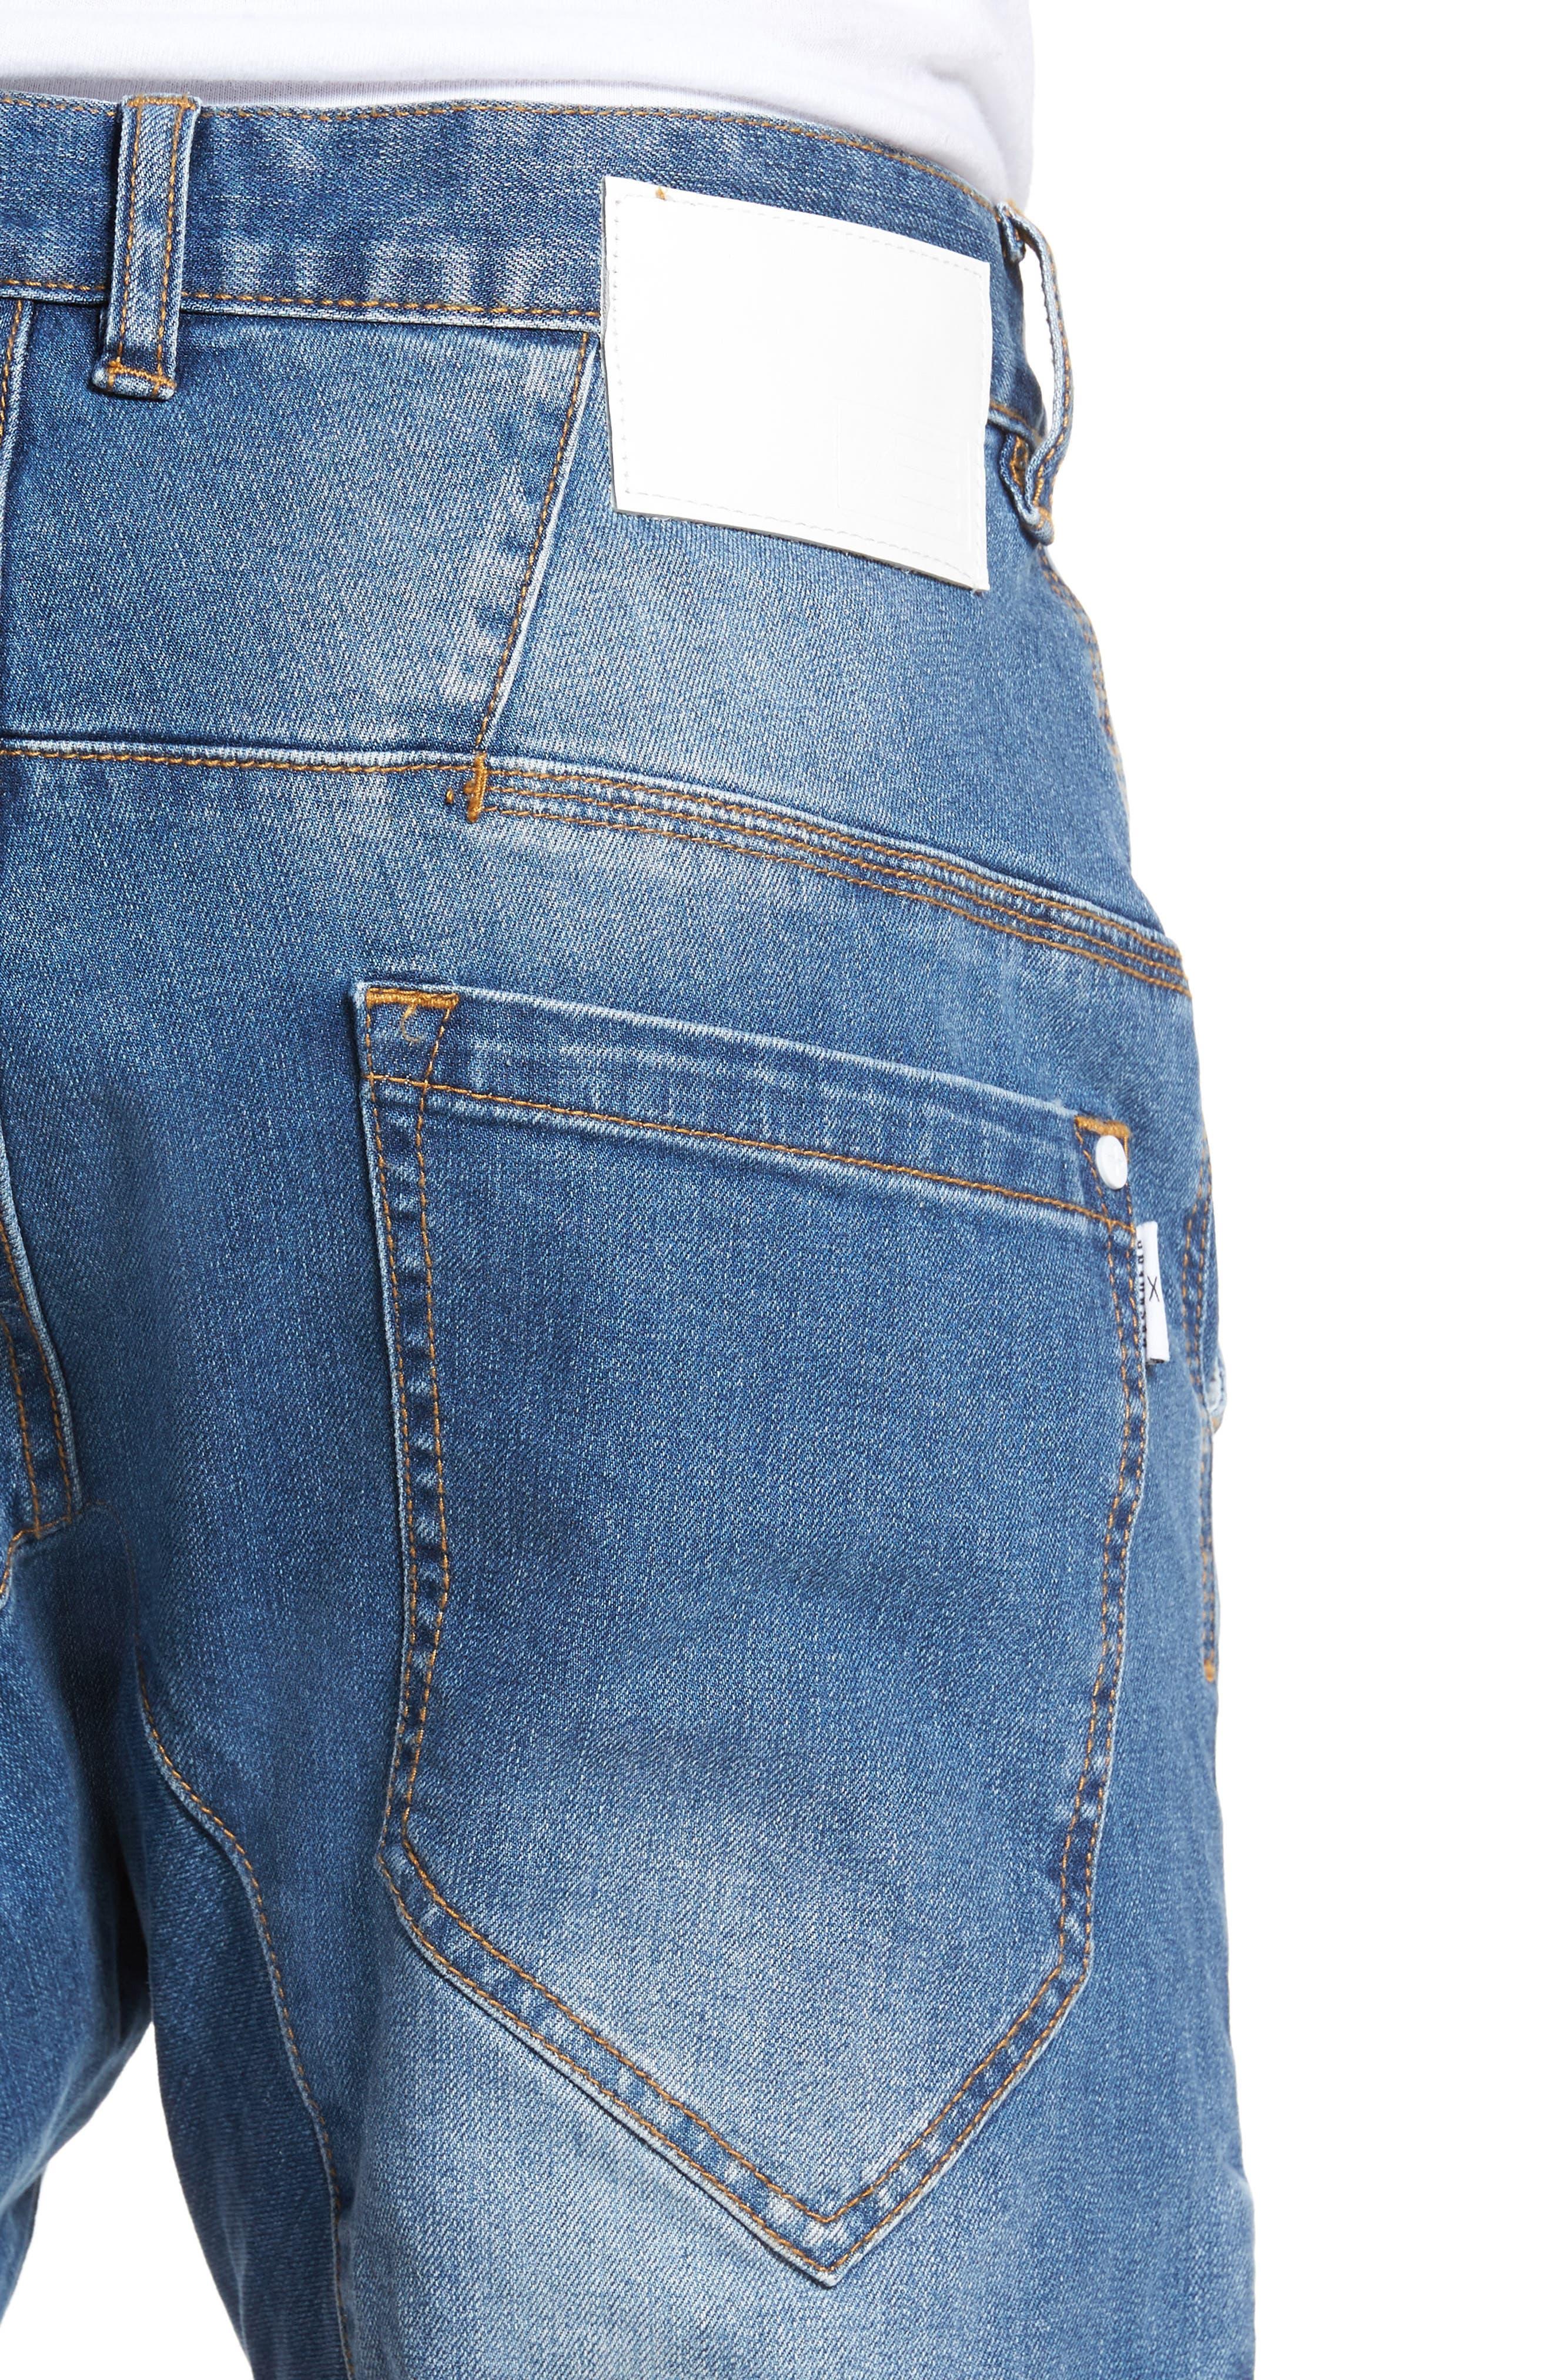 Flight Skinny Denim Jogger Pants,                             Alternate thumbnail 4, color,                             Lincoln Blue